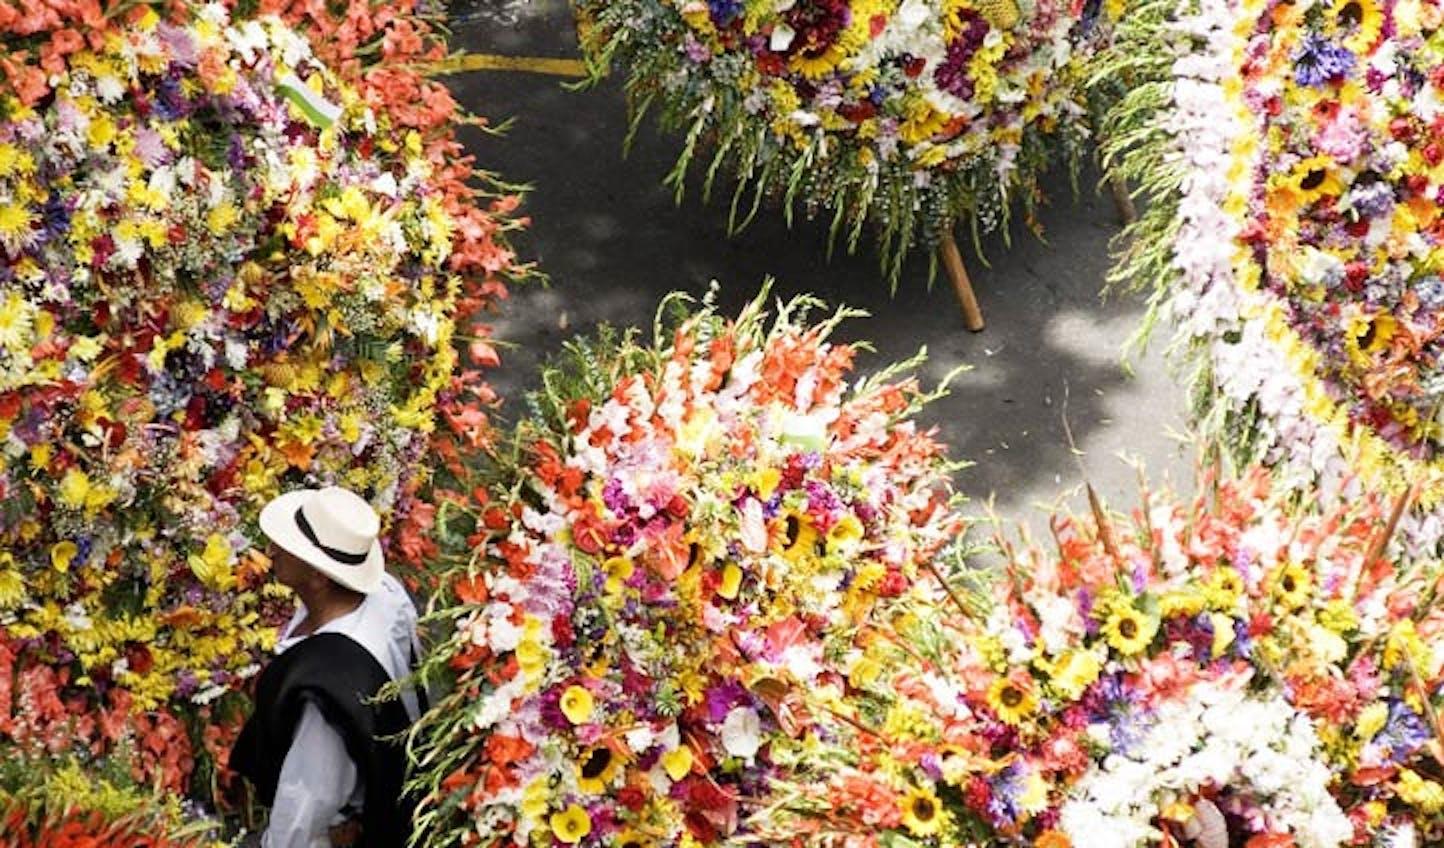 Flower festival parade in Medellin, Colombia